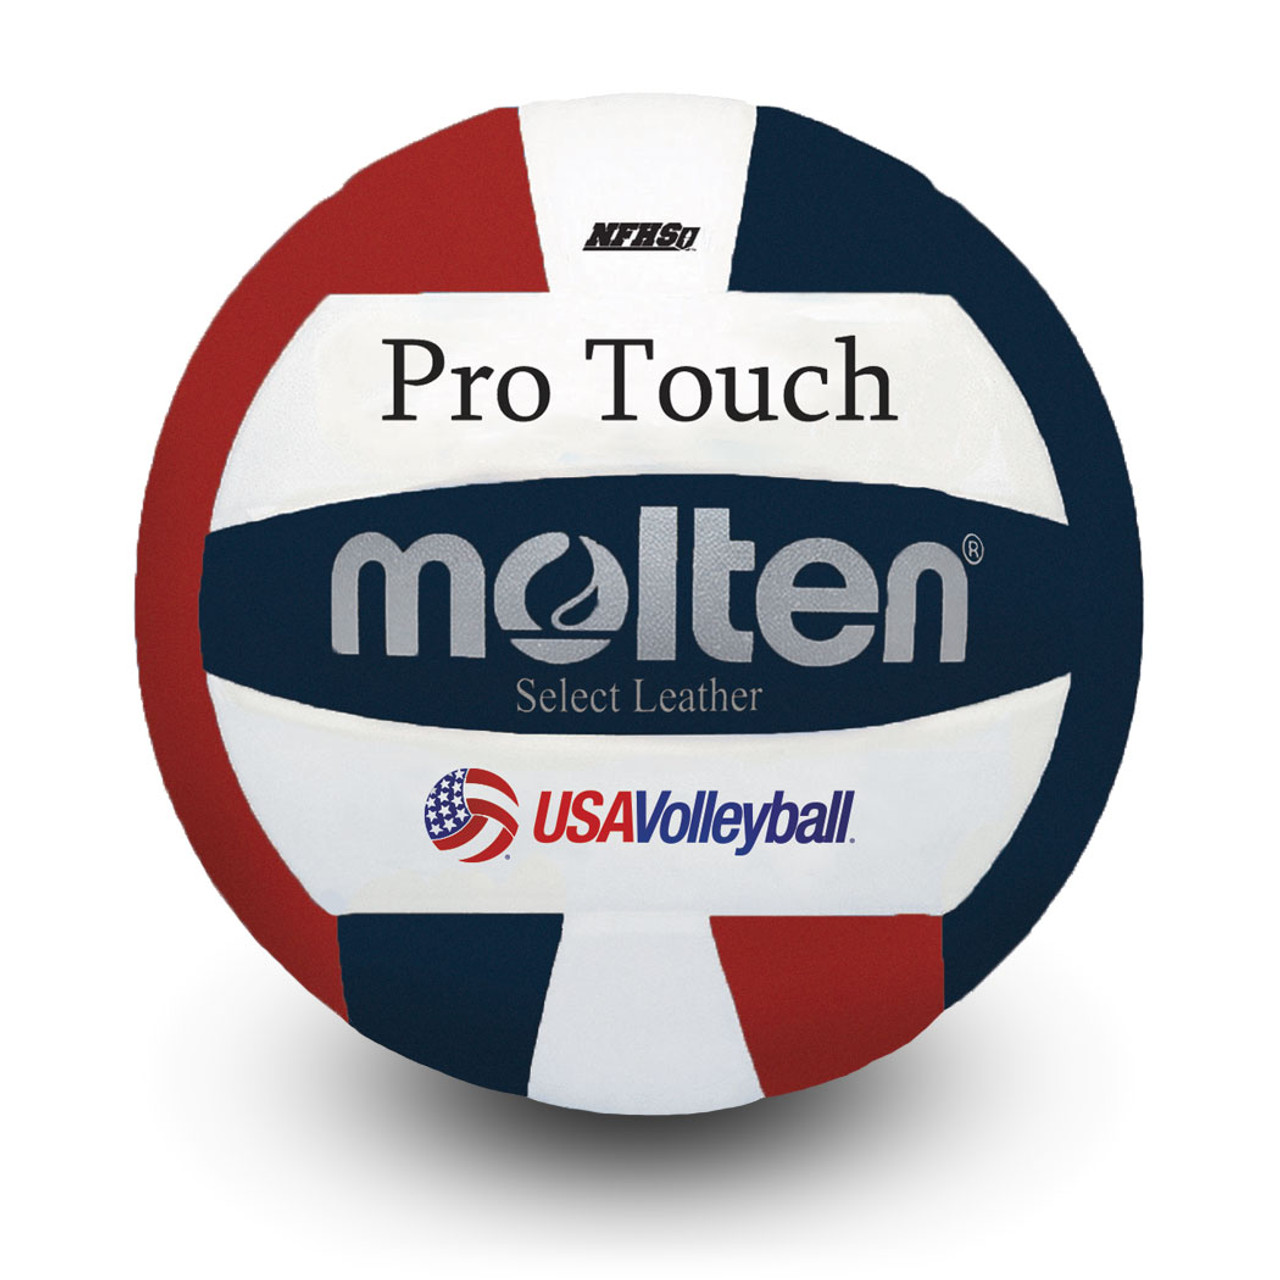 Pro Touch Usav Official Volleyball Molten Usa